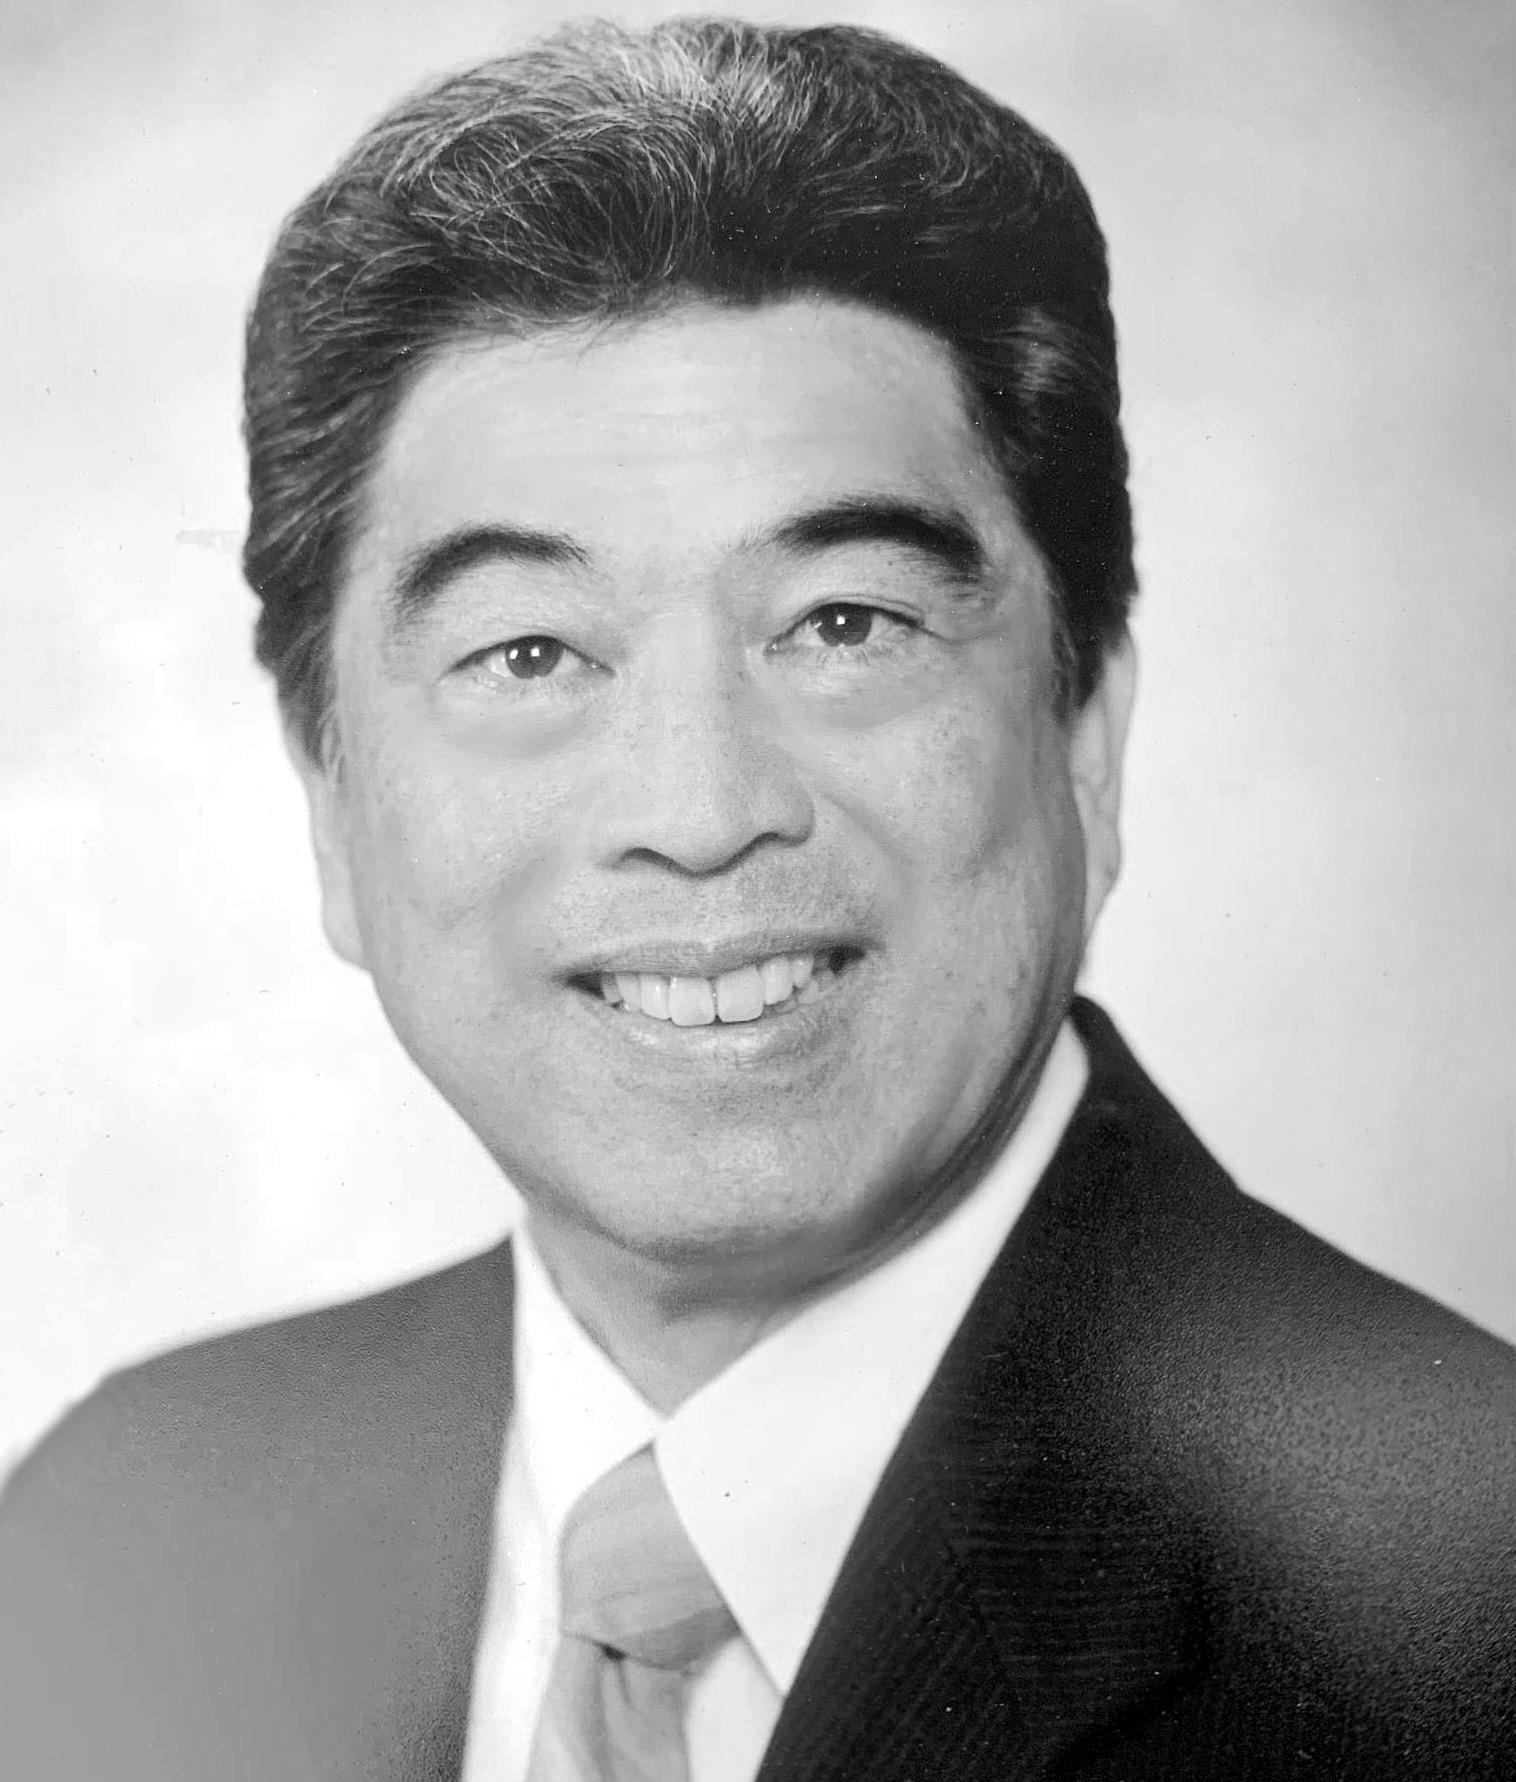 Ronald Kiyoshi Oshiro